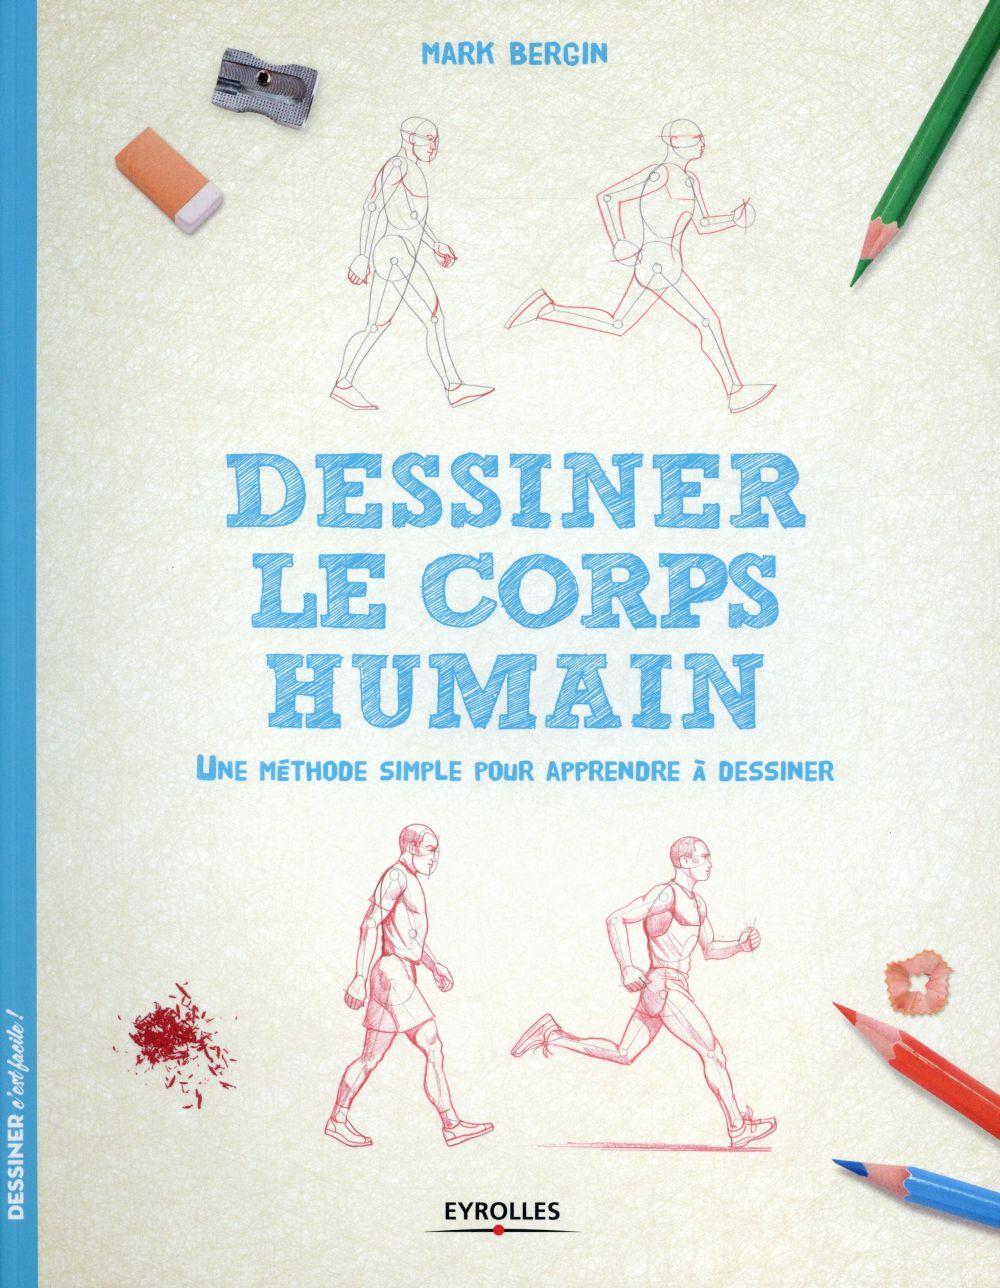 DESSINER LE CORPS HUMAIN  -  UNE METHODE SIMPLE POUR APPRENDRE A DESSINER Bergin Mark Eyrolles